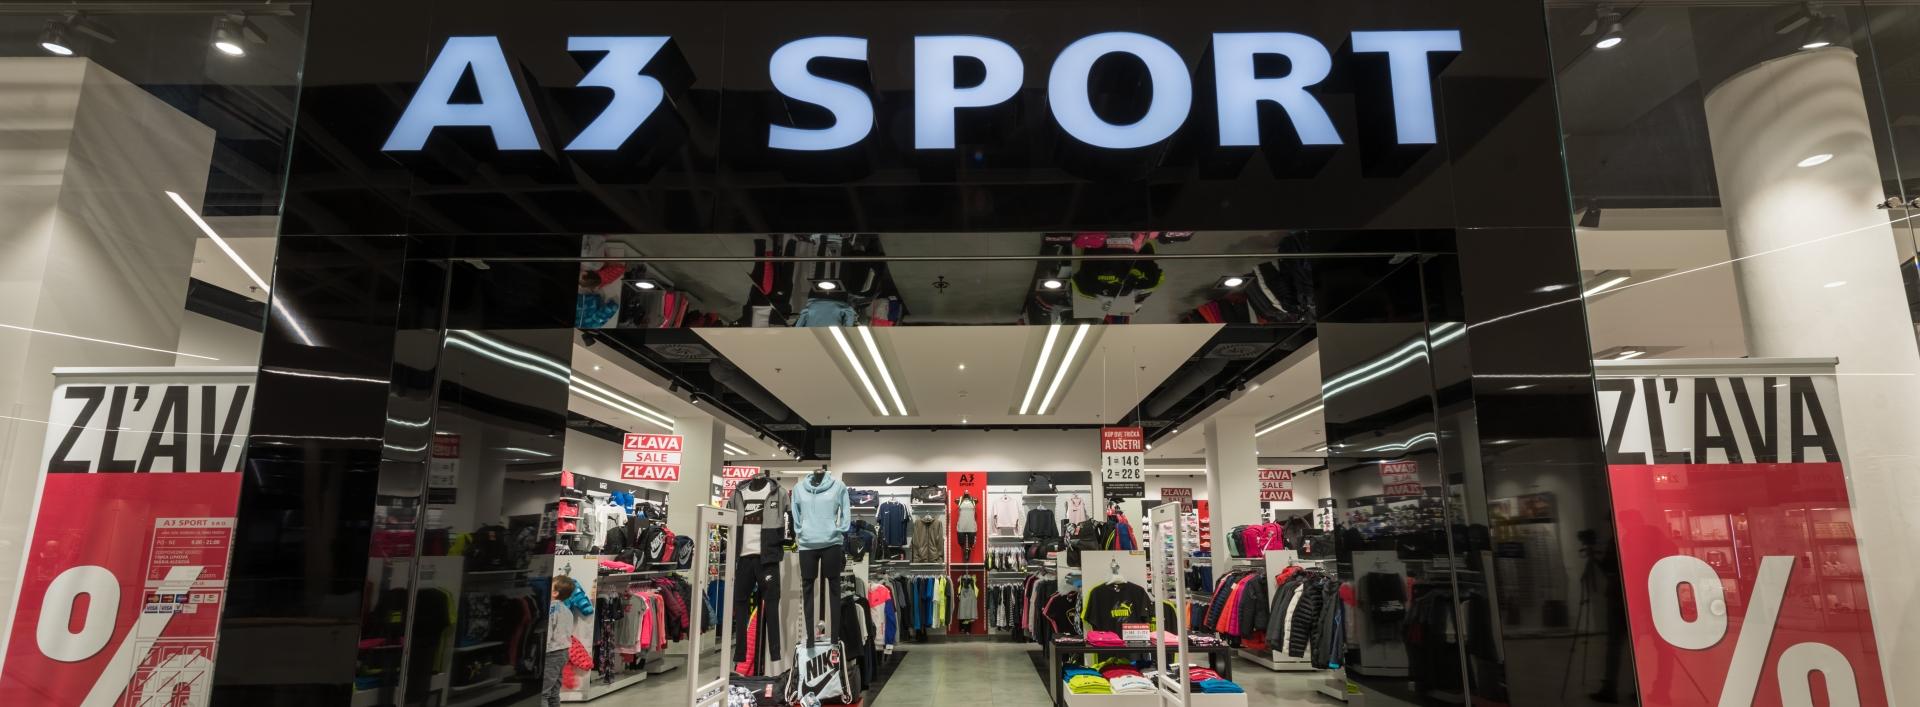 8471cb902fedc A3 SPORT | Eperia - Shopping mall